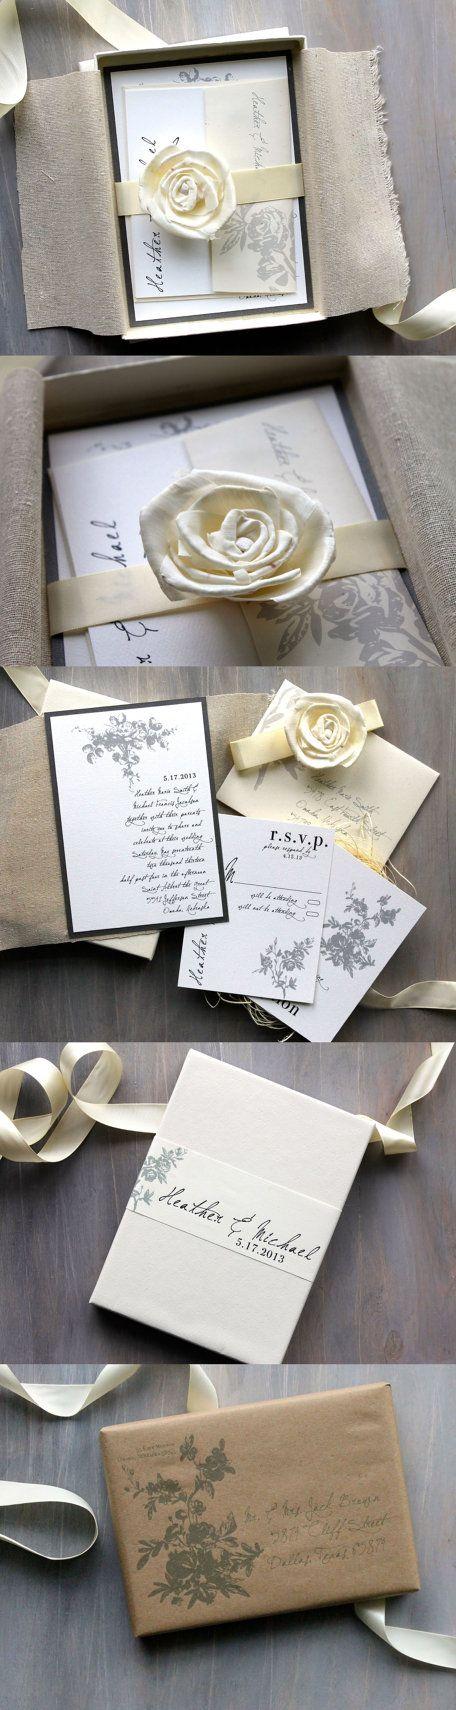 All White  Rustic Wedding Invitations Elegant Linen by BeaconLane